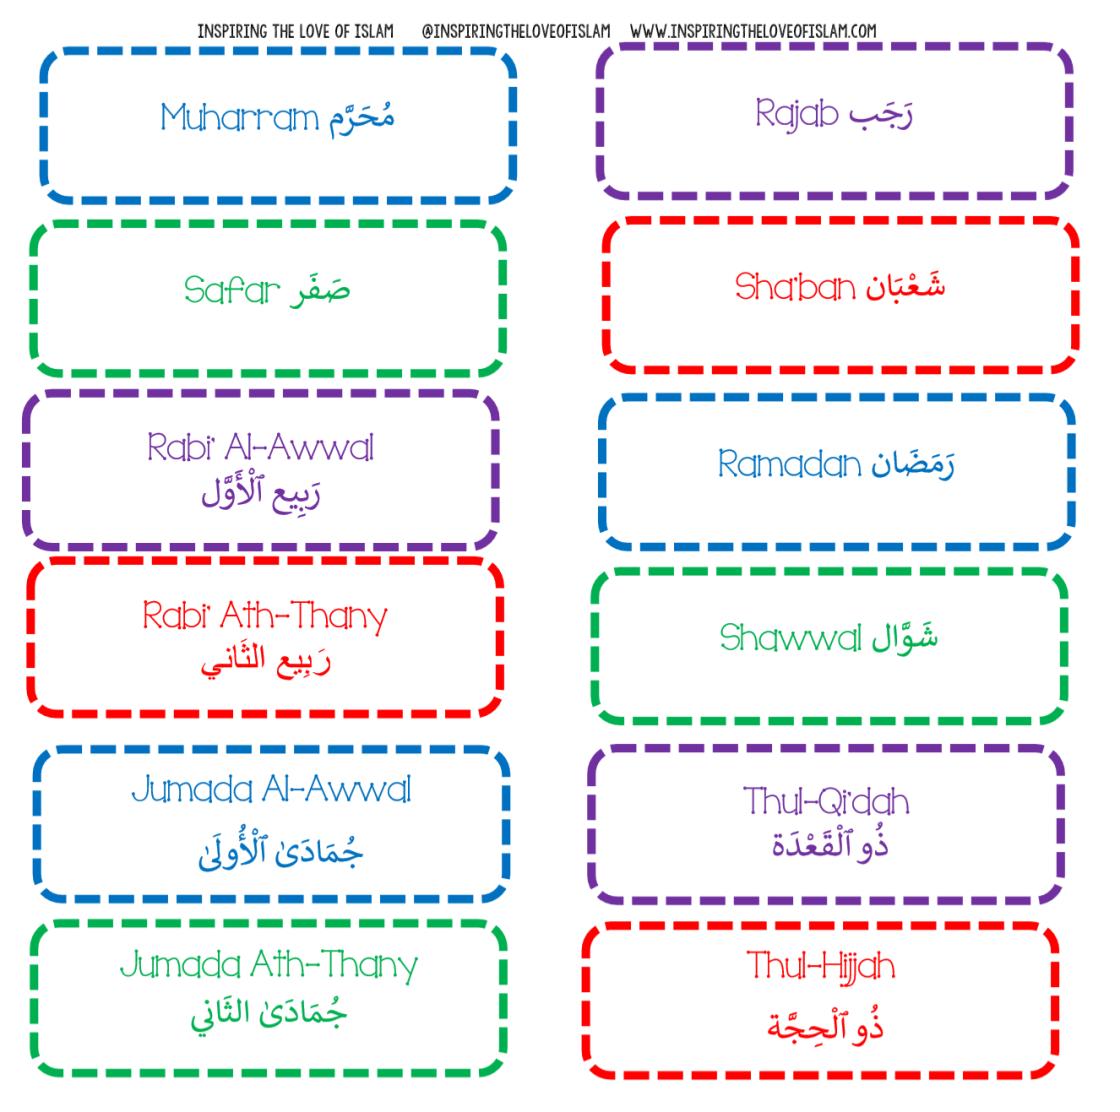 Islamic Month Cards & a BONUS! – Inspiring the Love of Islam